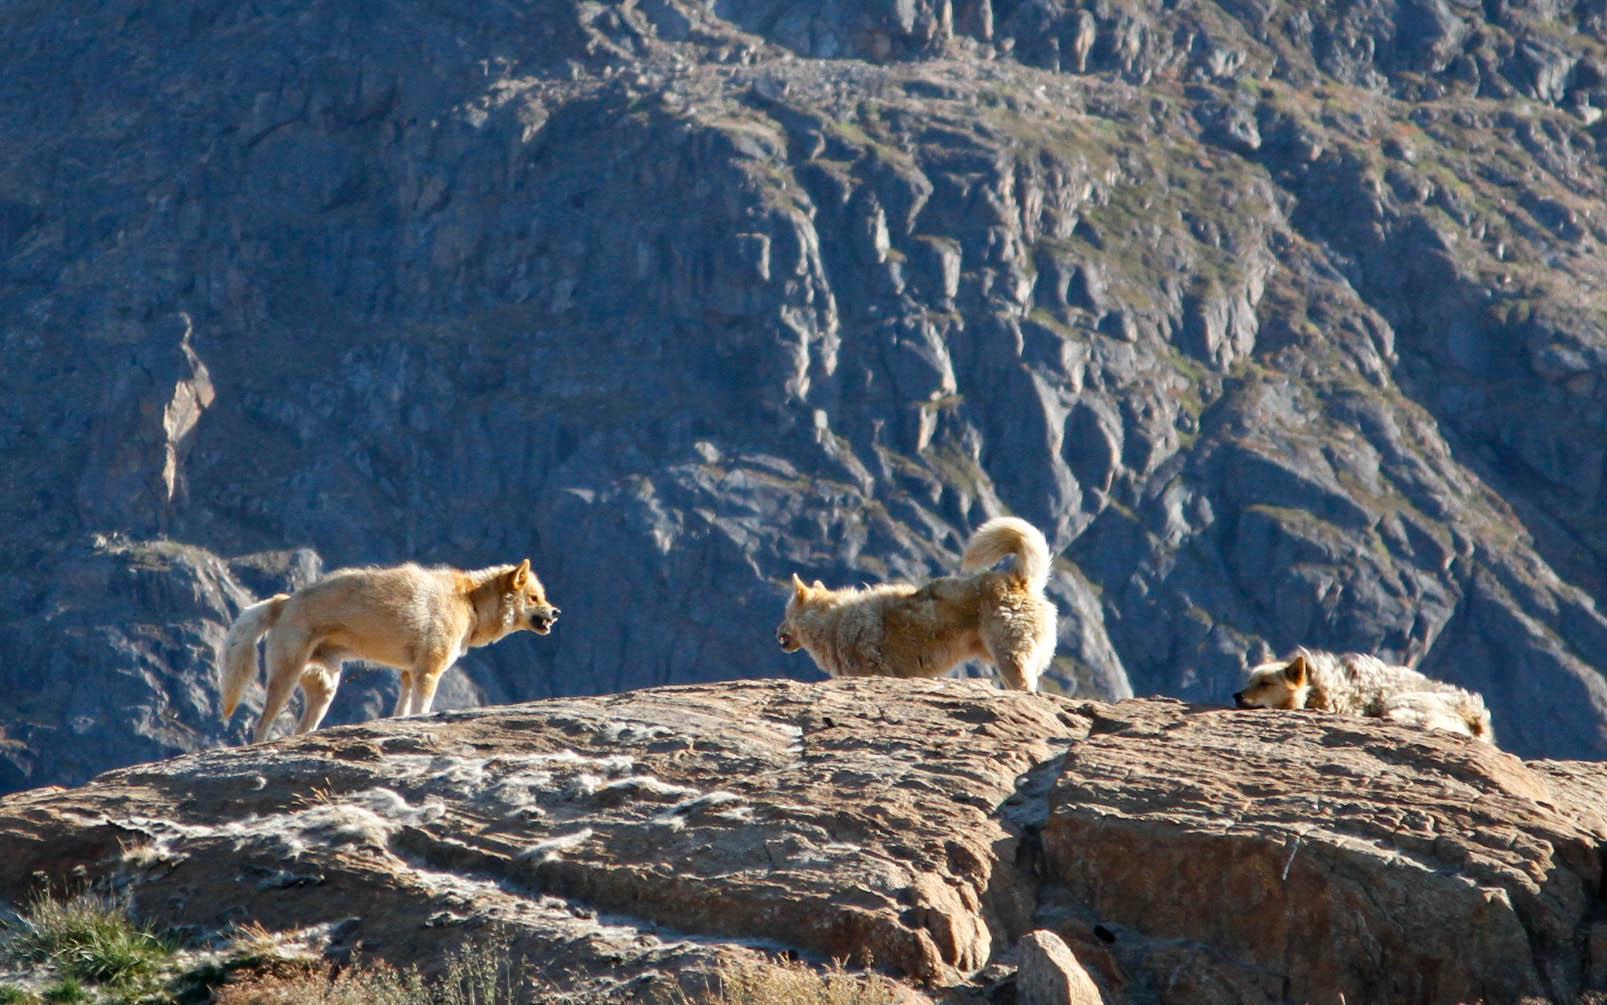 Sisimiut_dogtown_Greenland_Daven_Hafey.jpg